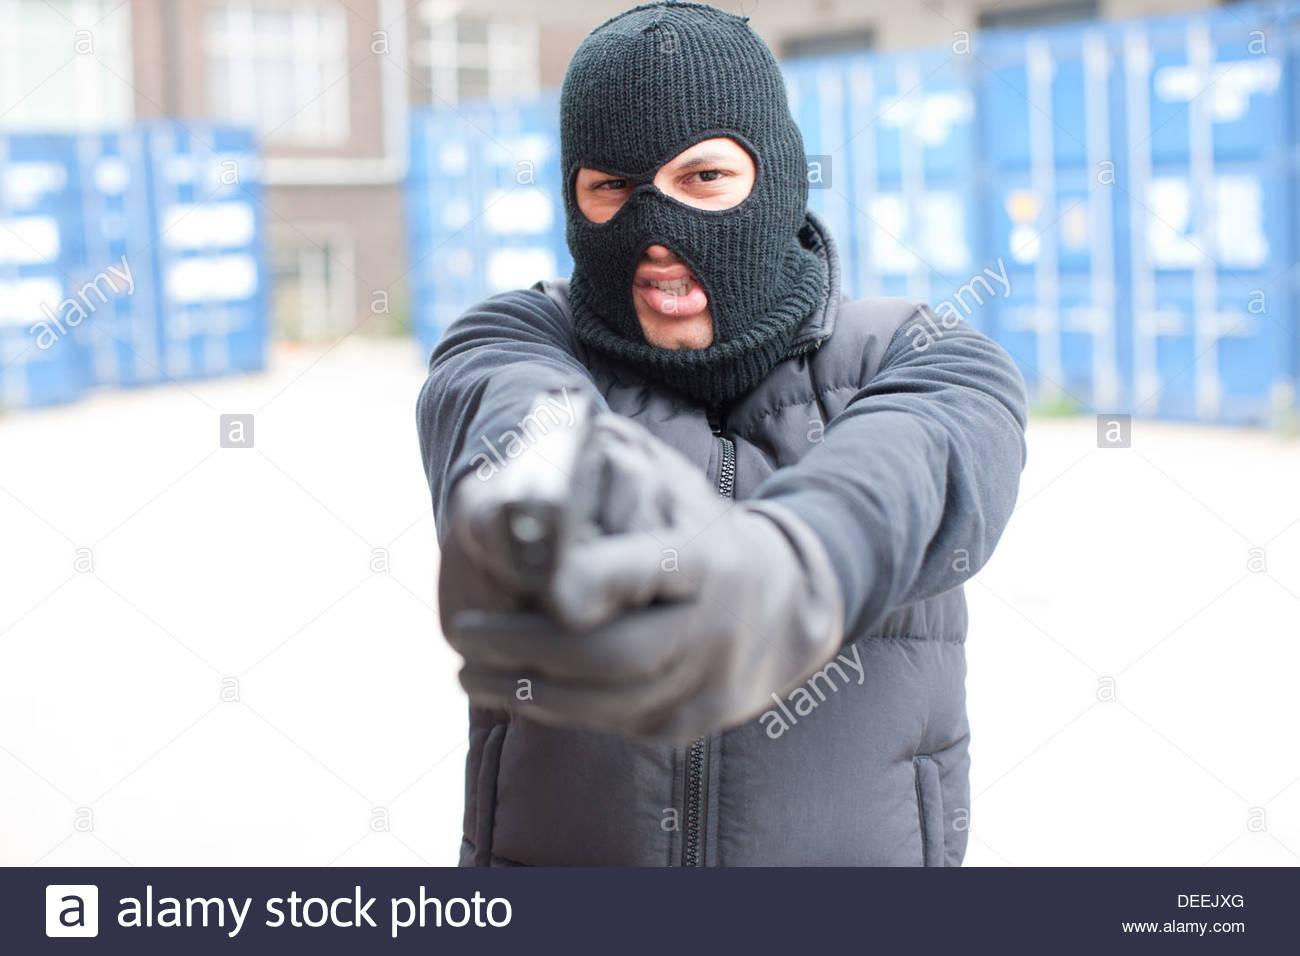 Man in ski mask holding gun Photo Stock